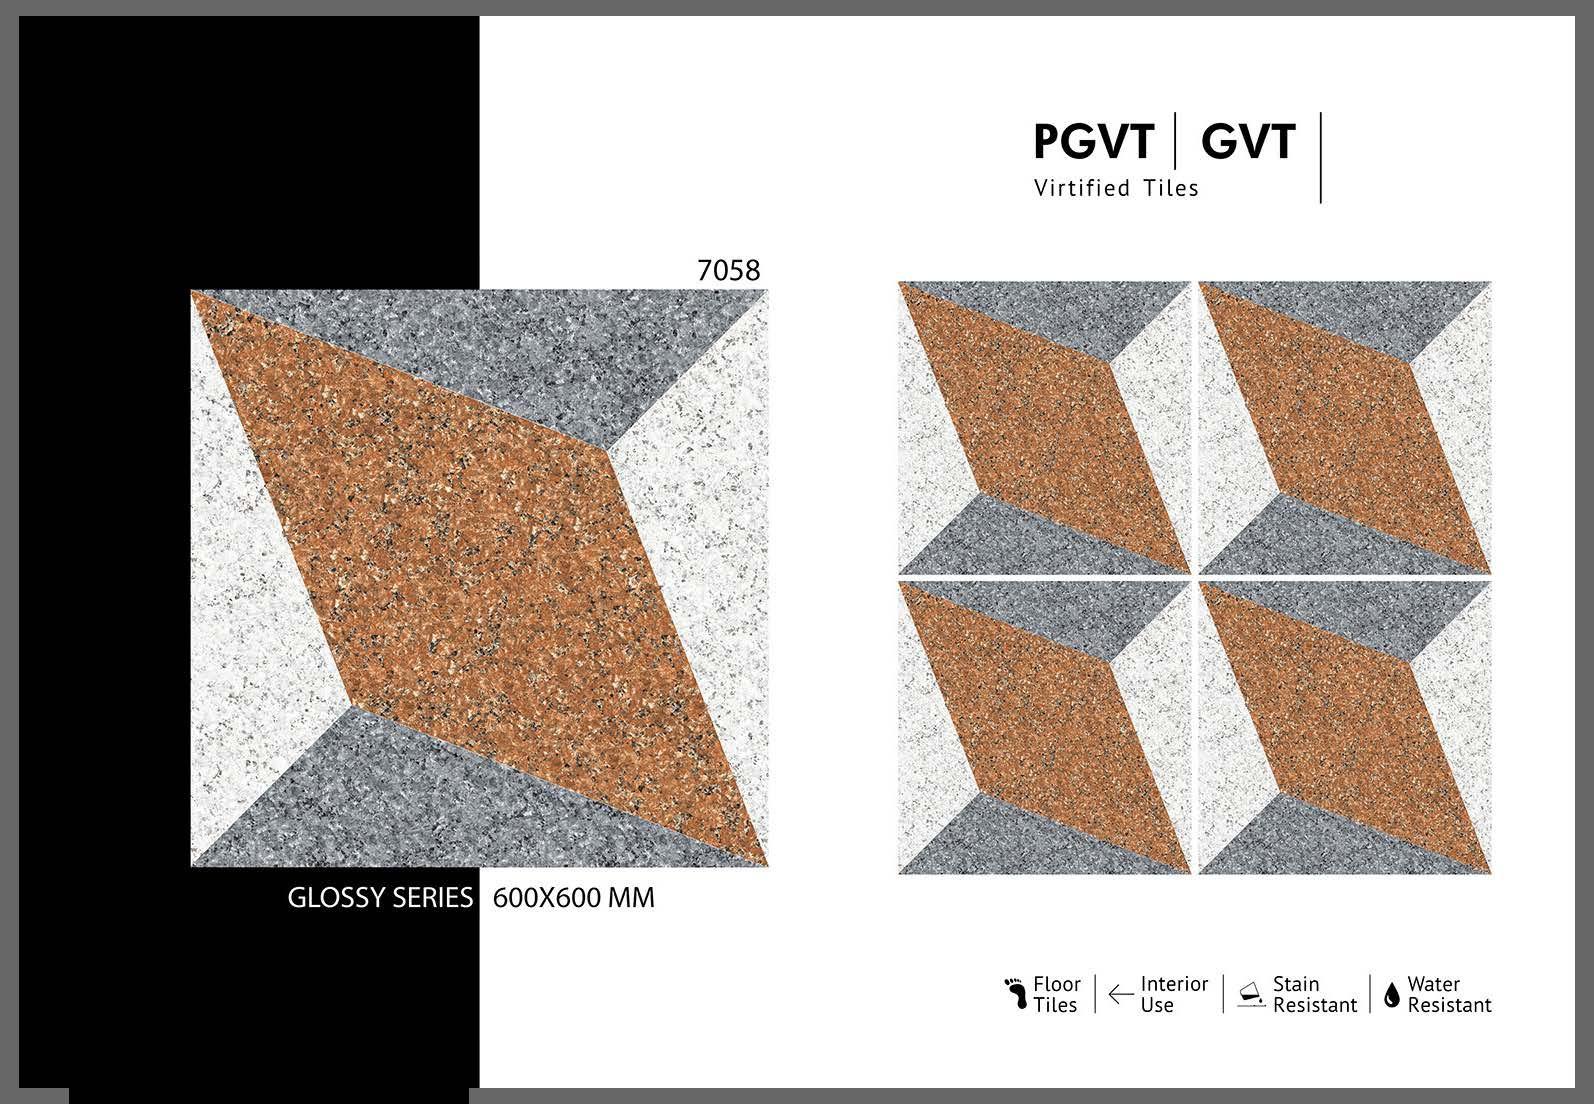 GVT 2X2 GLOSSY_Page_45.jpg